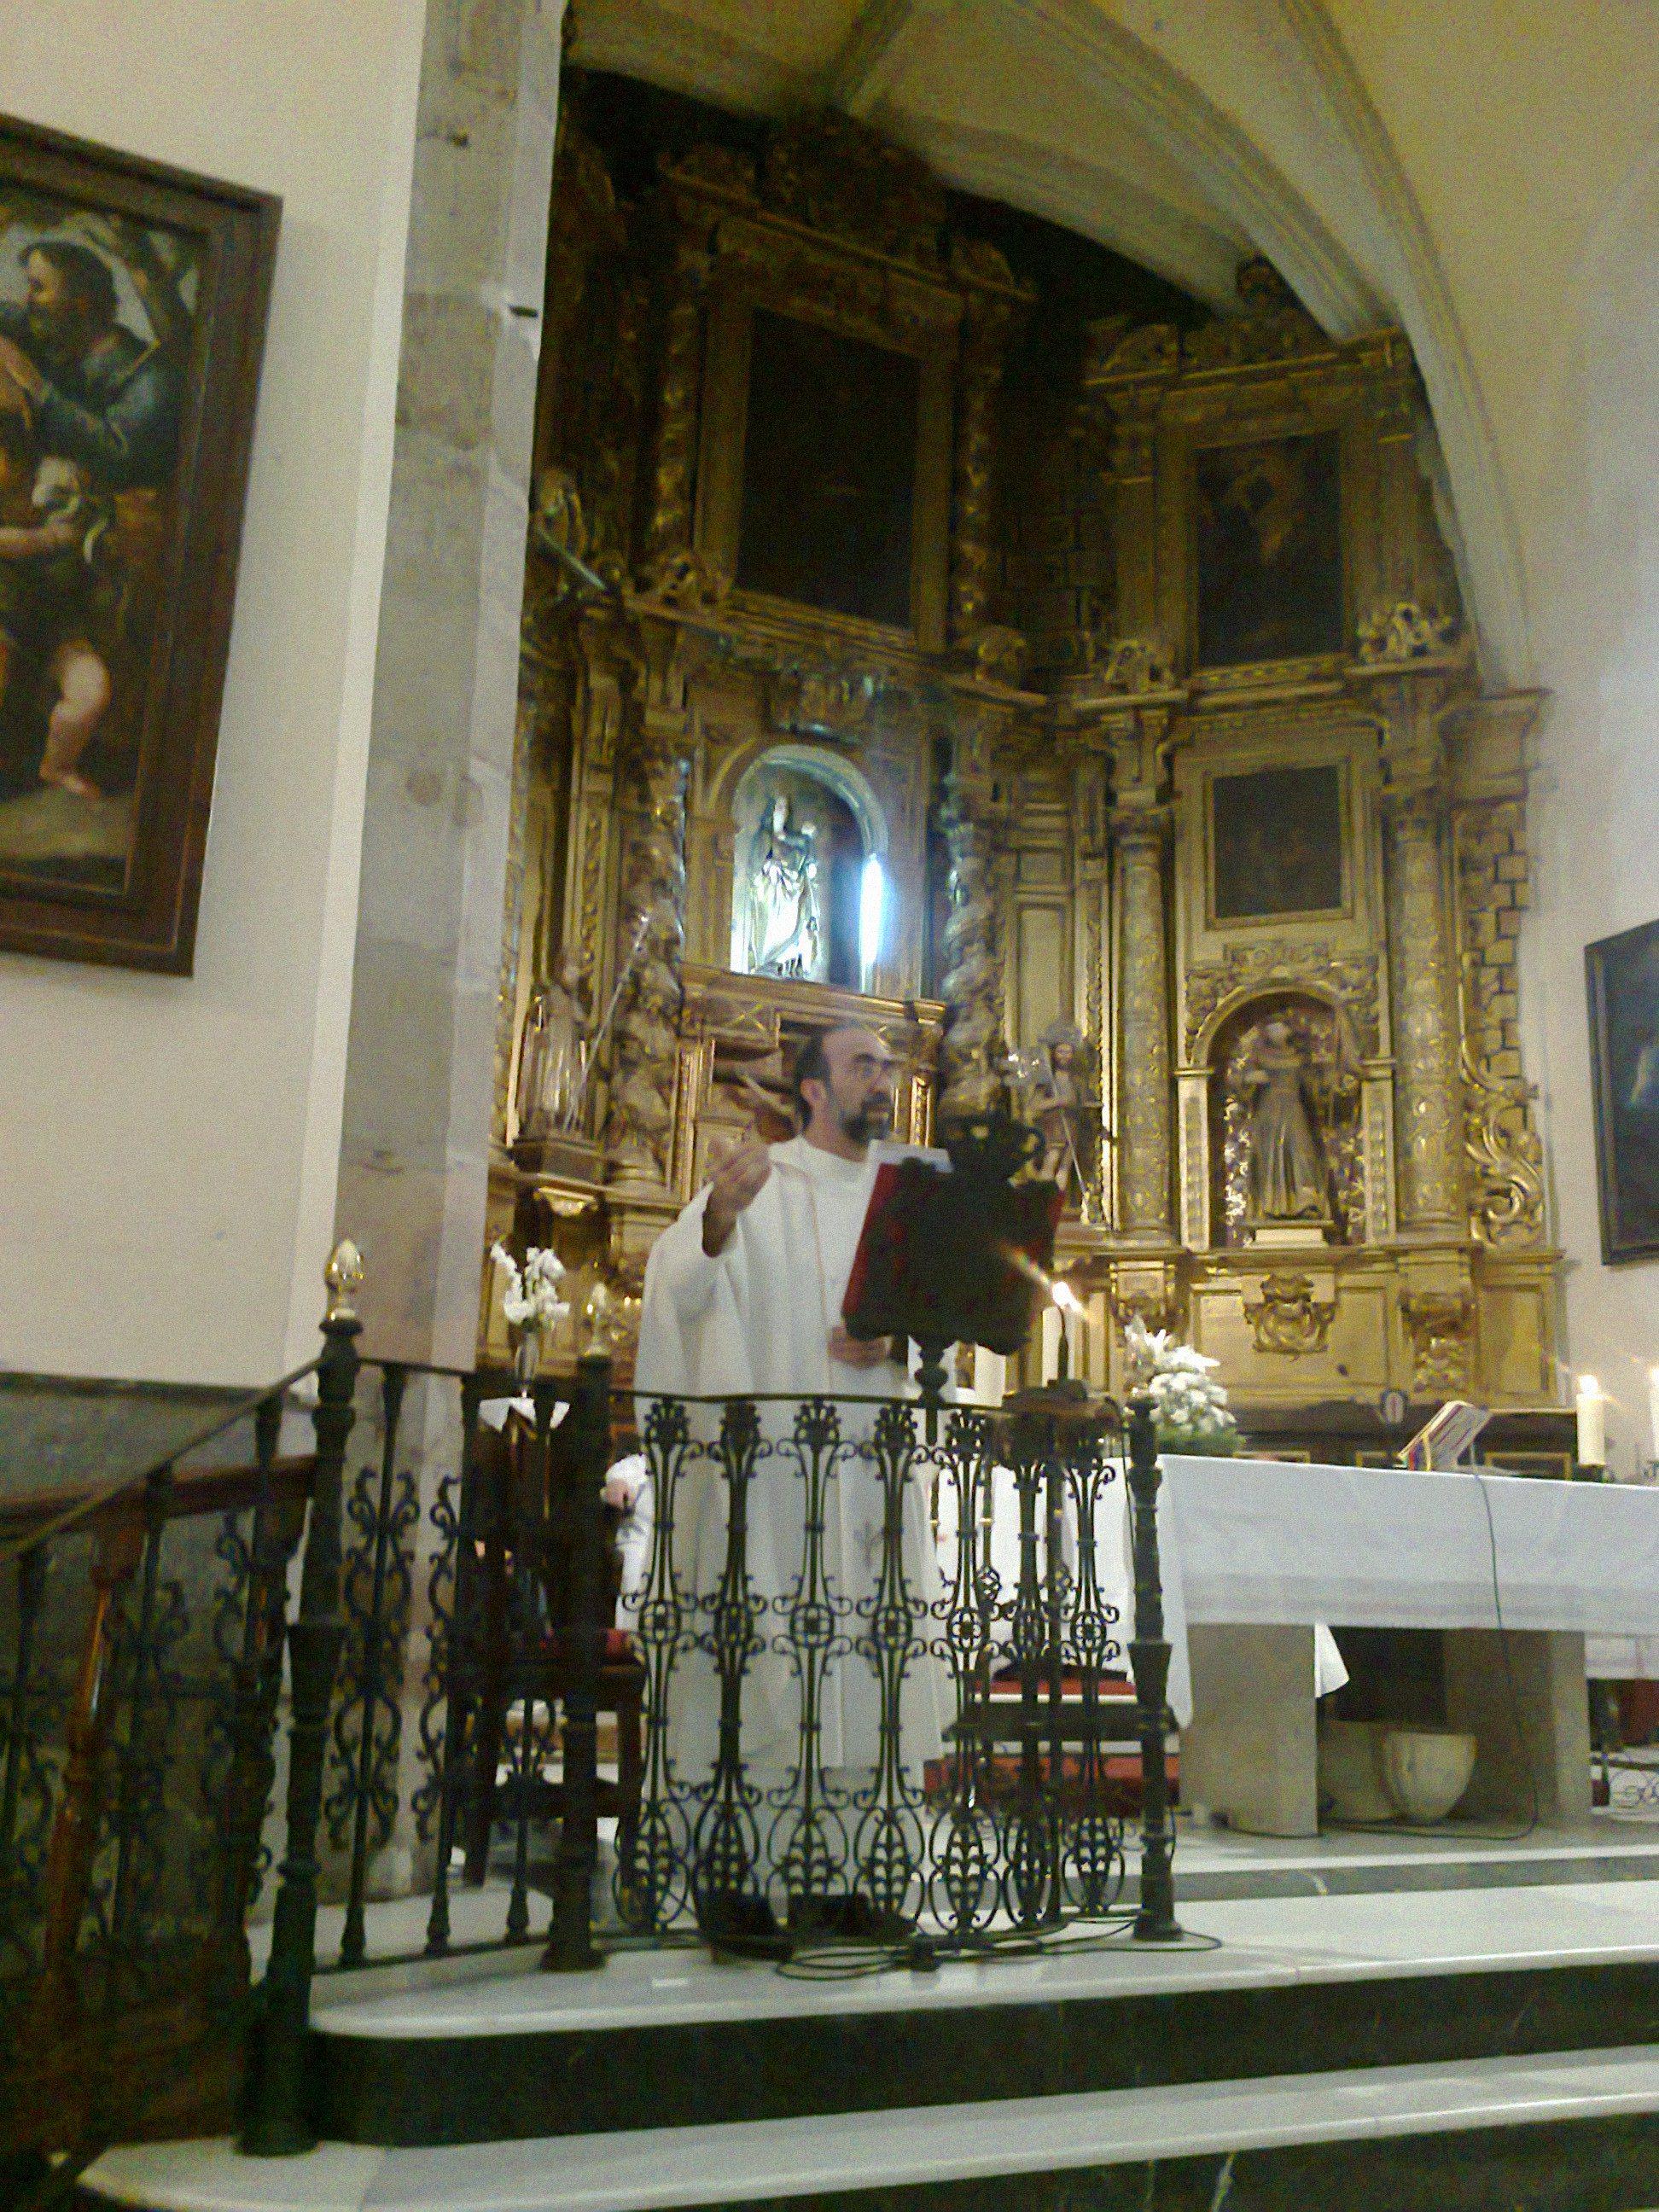 Hoy se celebran las bodas de oro y plata matrimoniales